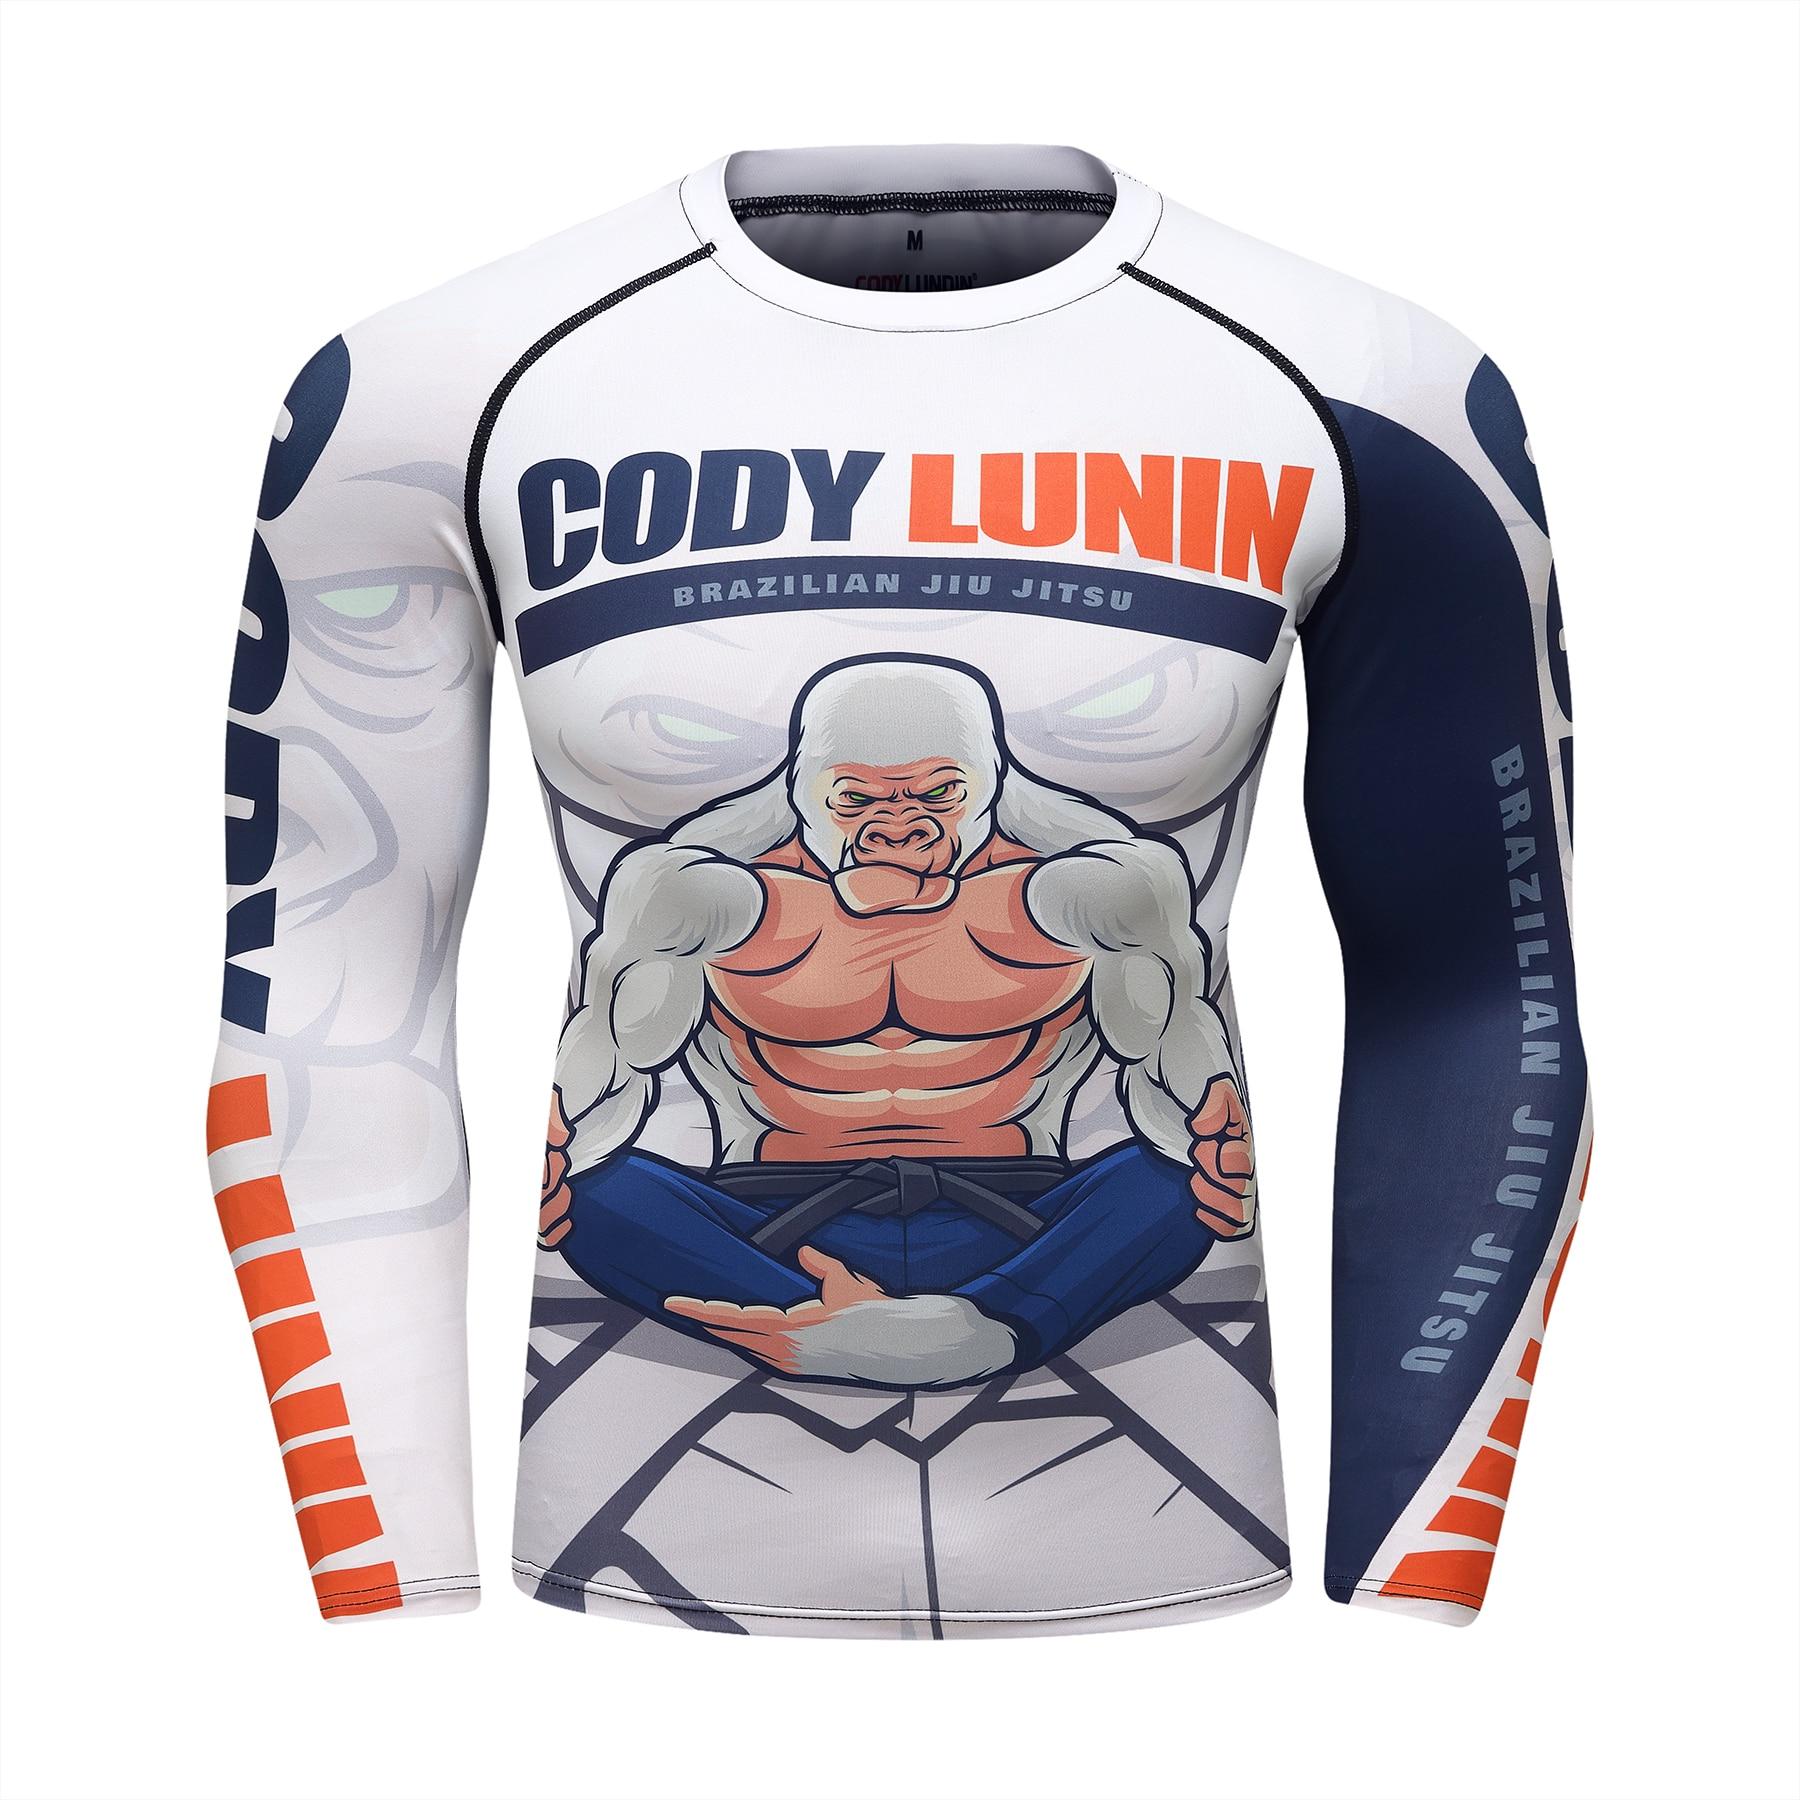 Boxing Jerseys Muay Thai Gym Training T-shirt Compression Men Sports Shirts MMA Rashguard Jiu Jitsu Fitness Men Boxeo T Shirt